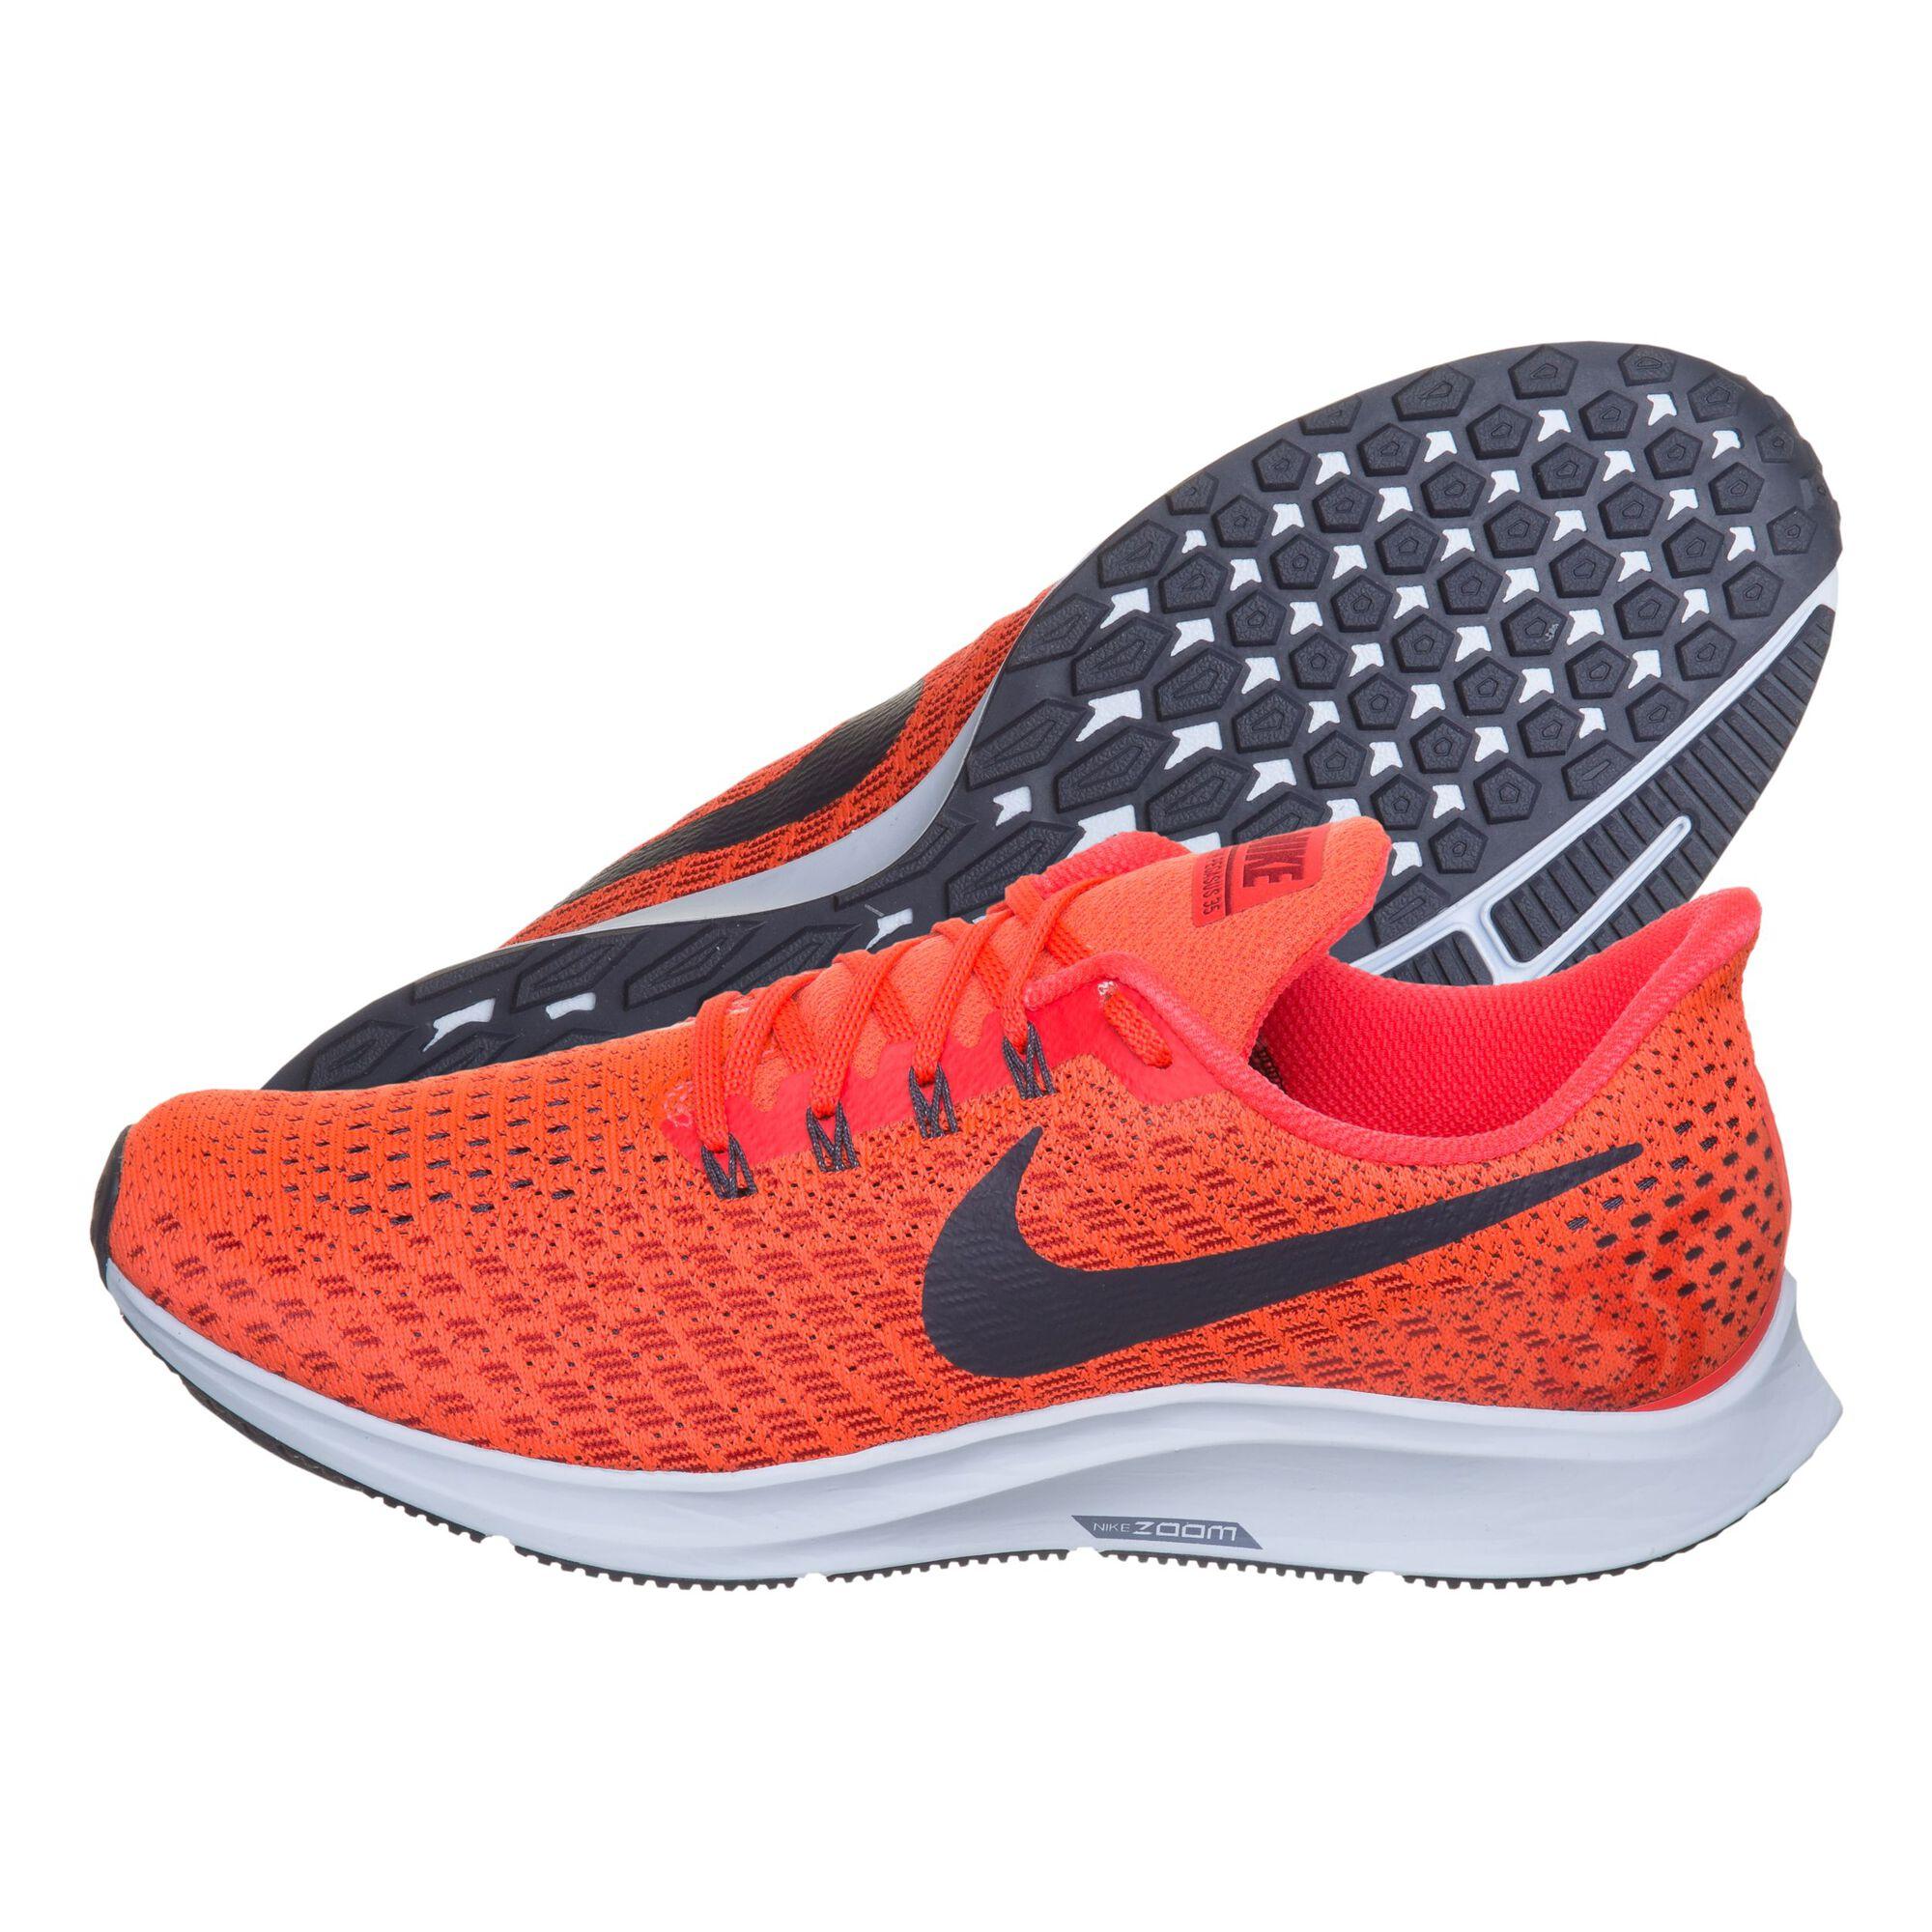 buy online a9de3 9eb23 buy Nike Air Zoom Pegasus 35 Neutral Running Shoe Men - Orange ...